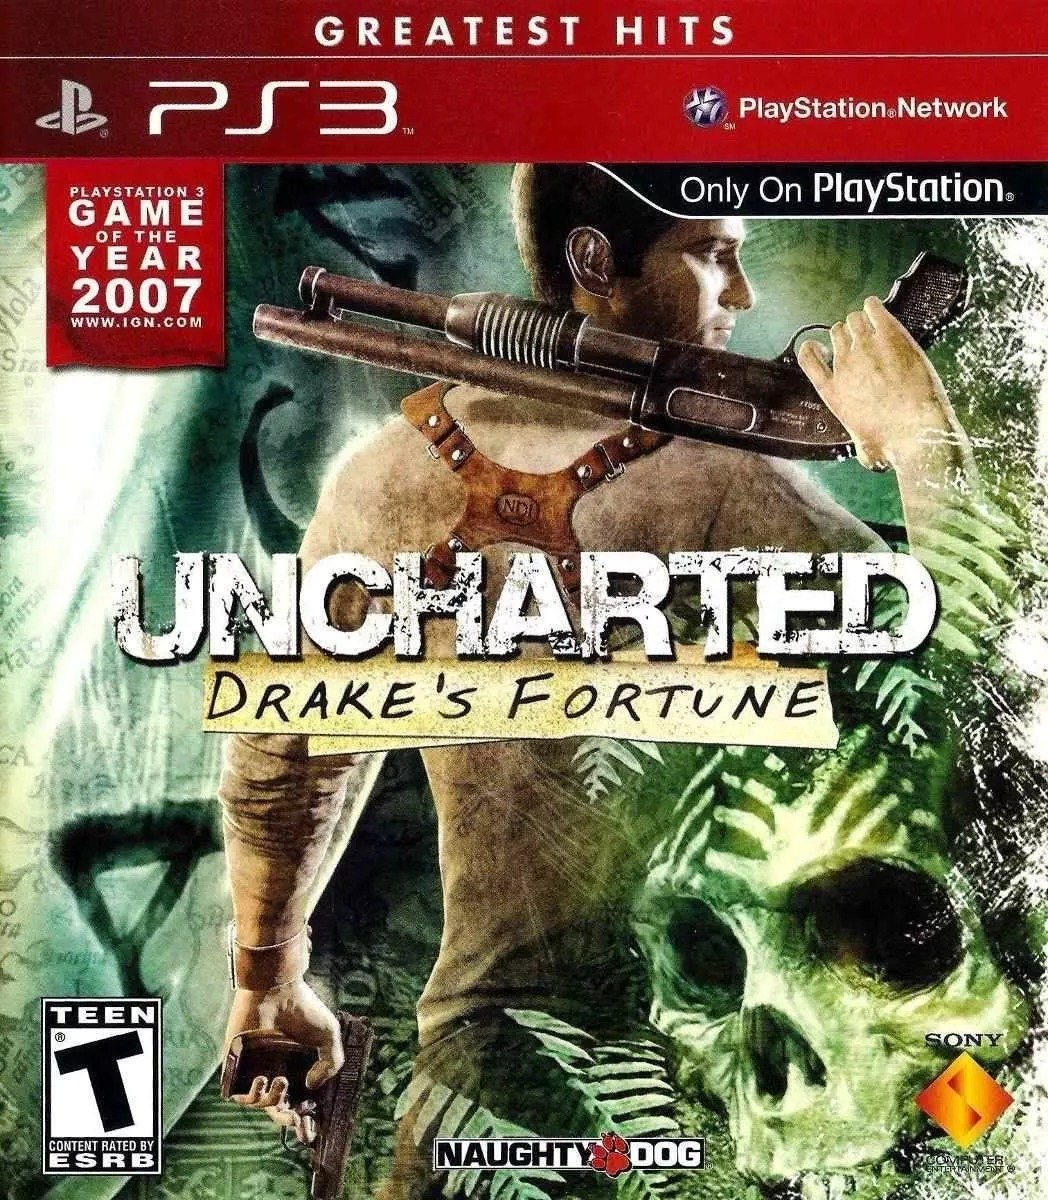 Uncharted: El tesoro de Drake (Uncharted: Drake's Fortune)